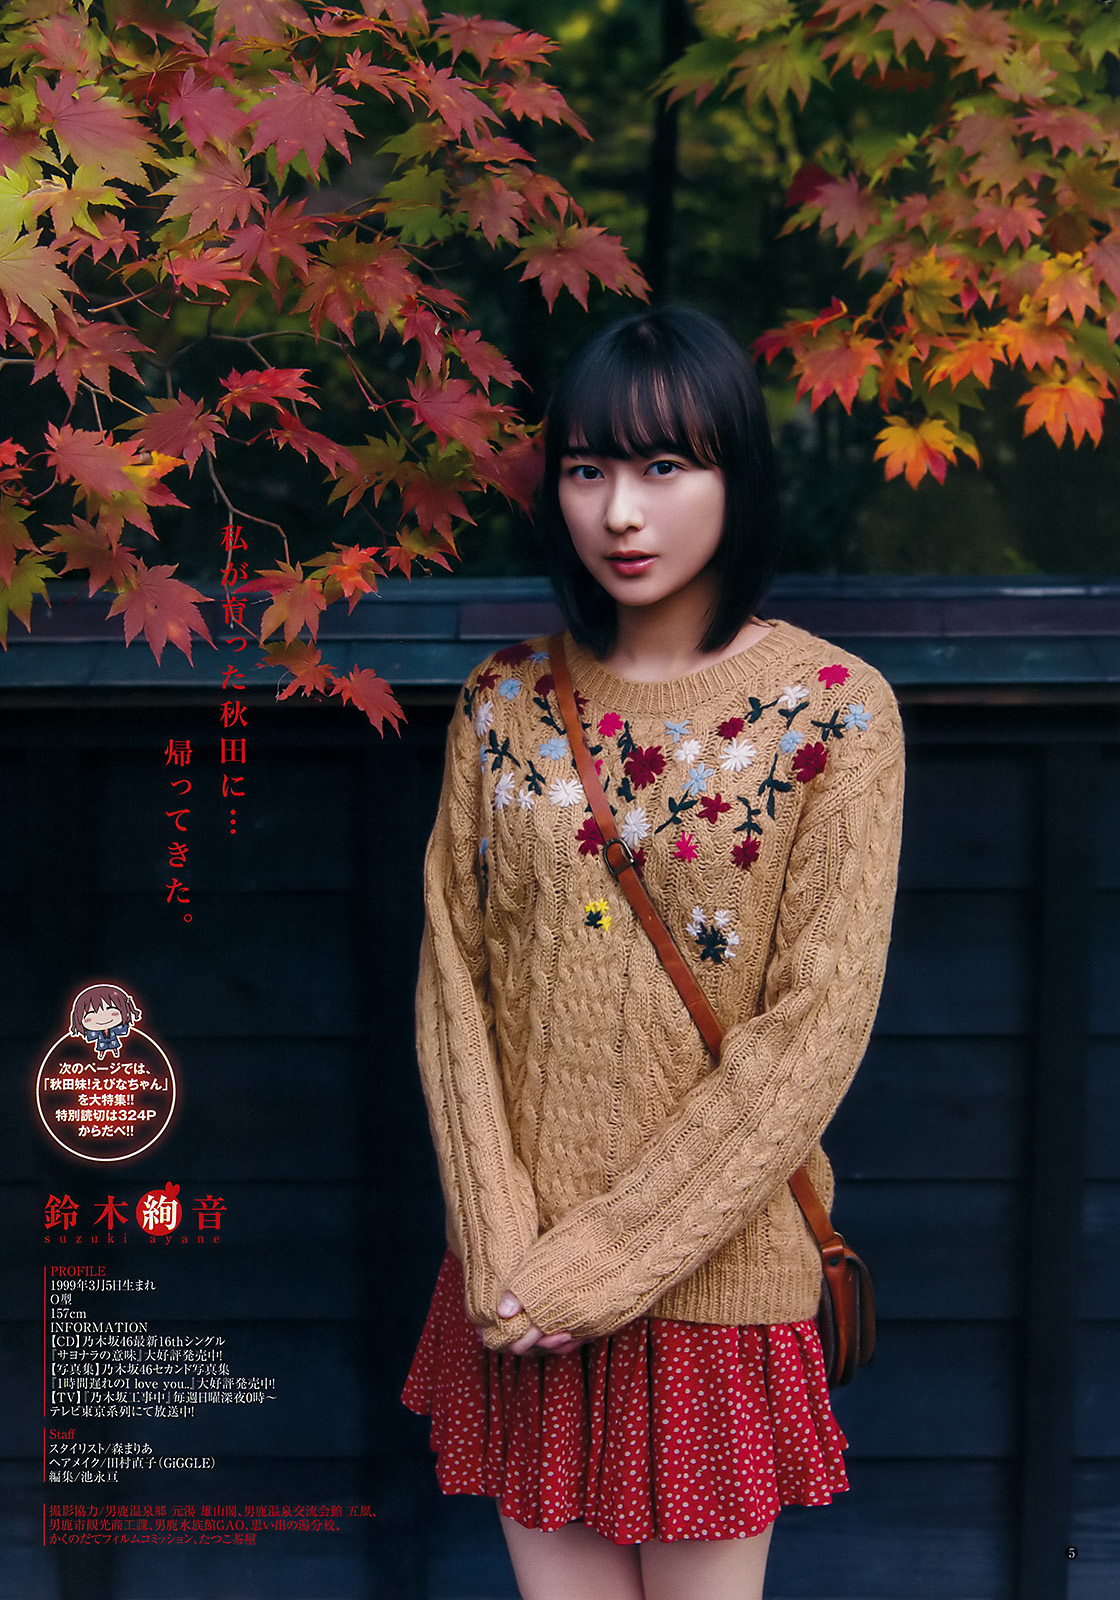 Suzuki Ayane 鈴木絢音 Nogizaka46, Young Jump 2016.12.1 No.51 (週刊ヤングジャンプ 2016年51号)